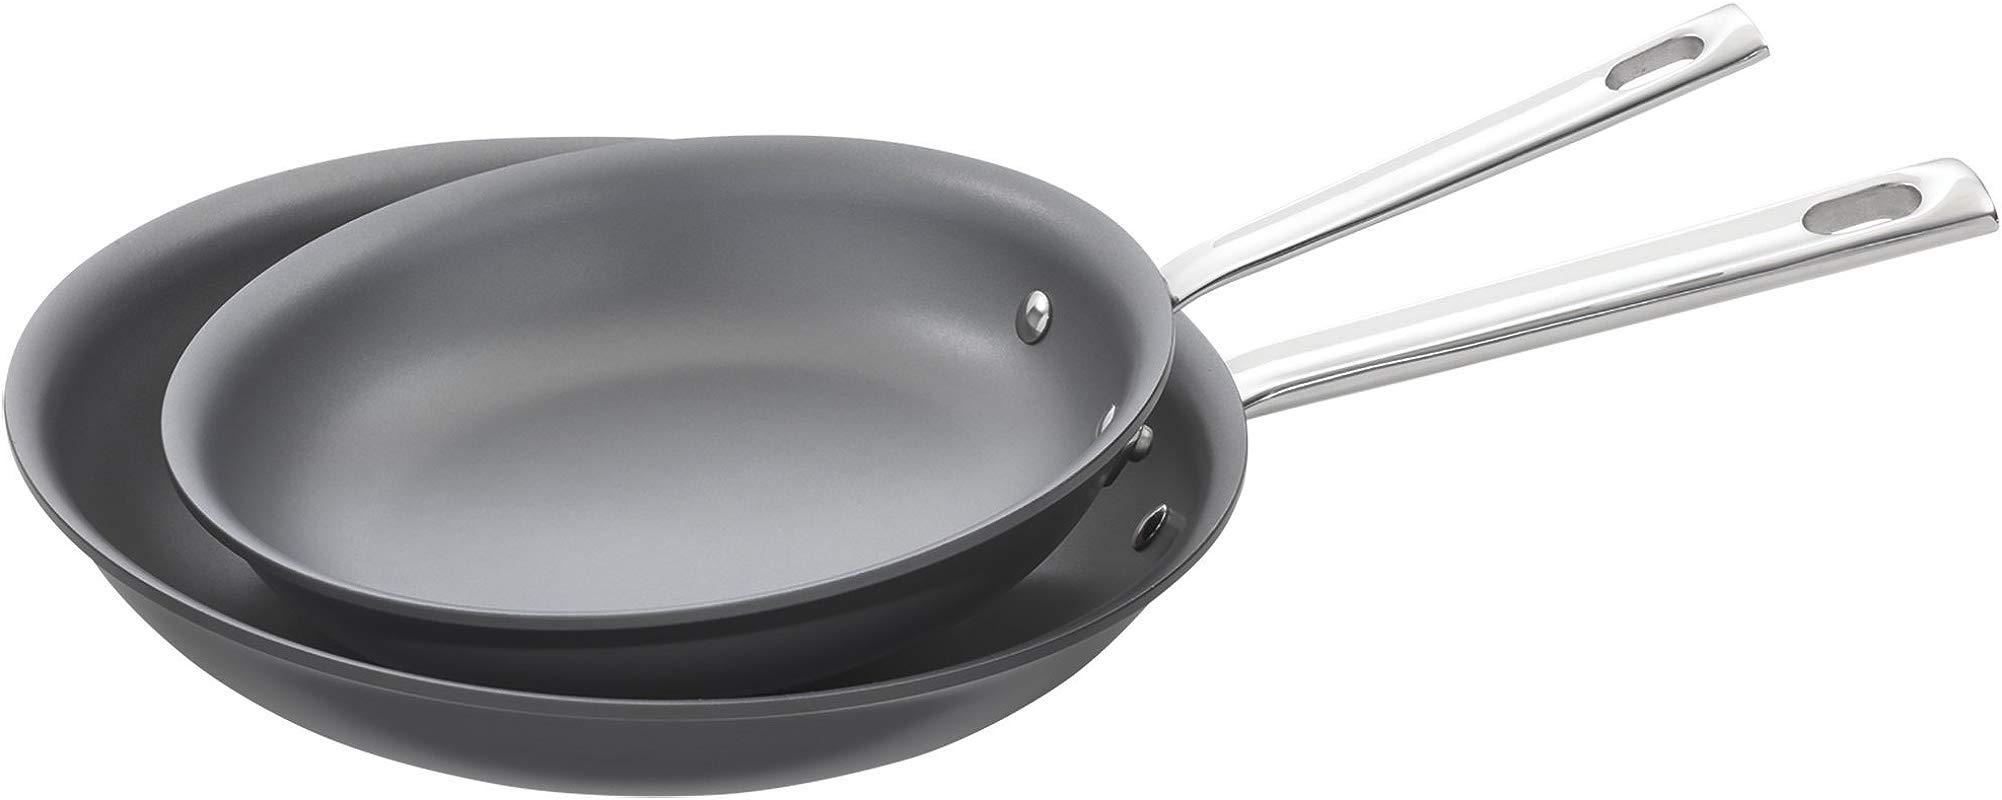 Emeril Lagasse 62924 Fry Pan Gray Renewed